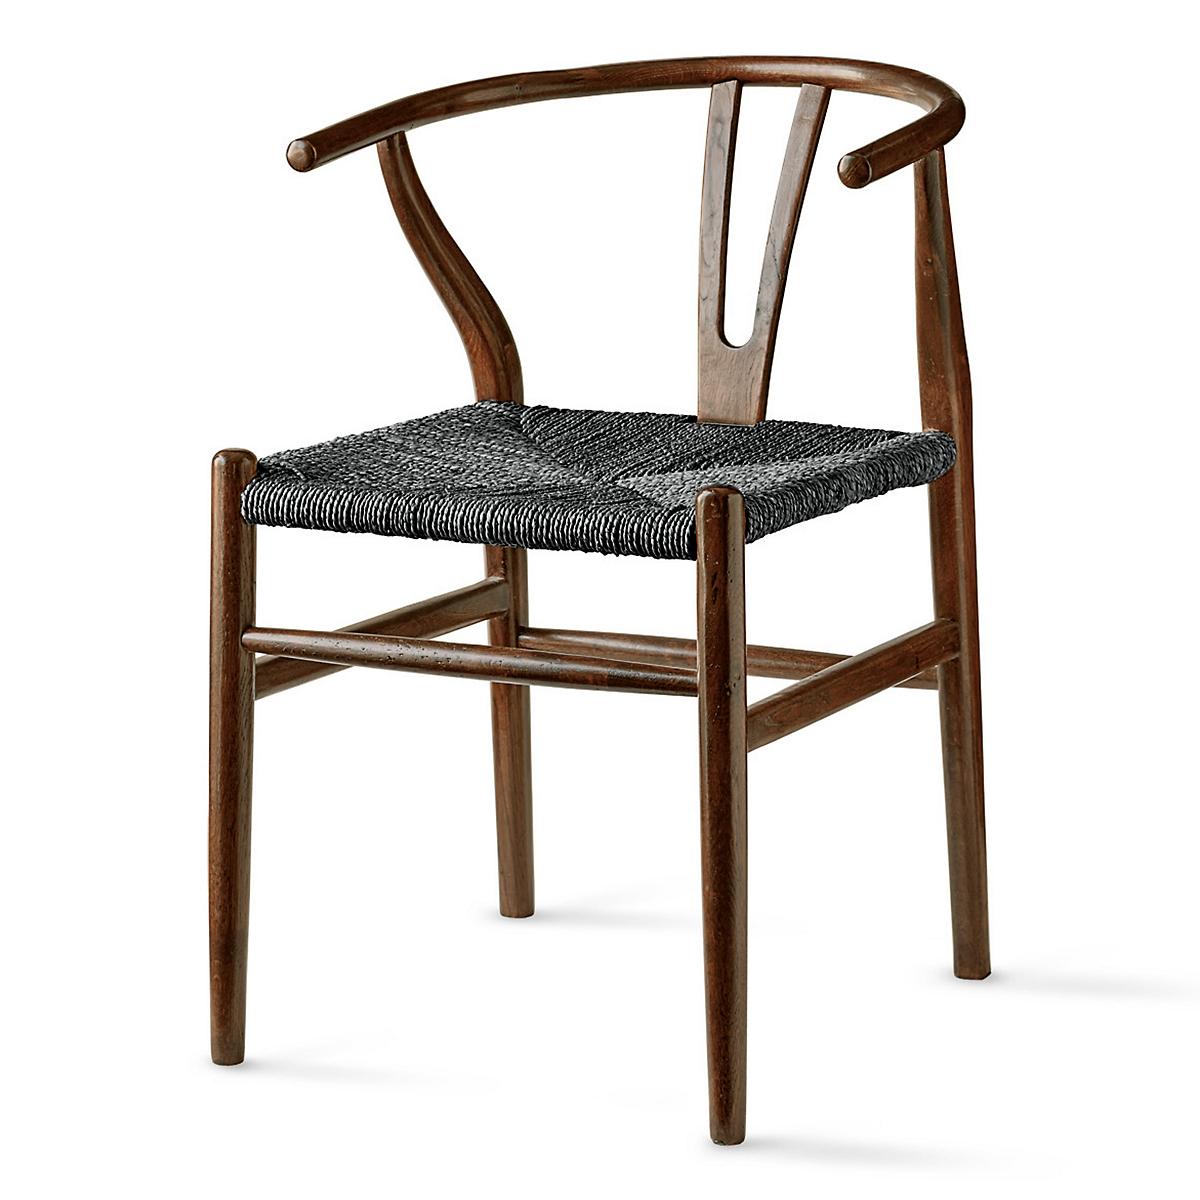 Delicieux Horseshoe Chair, Espresso